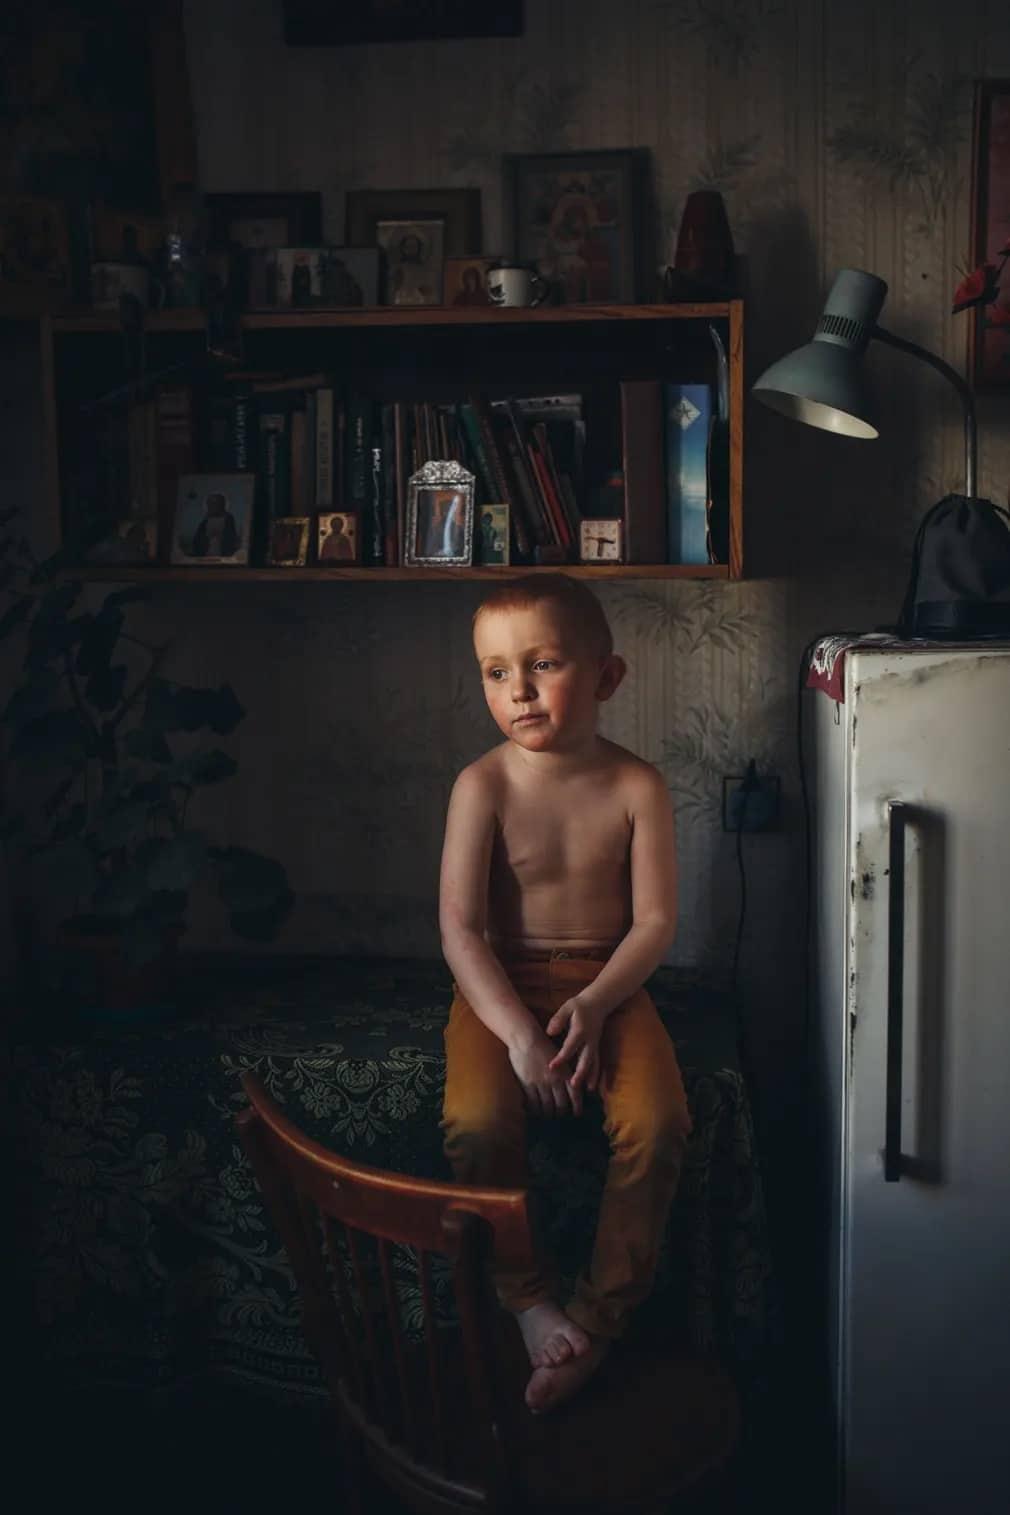 Sony World Photography Awards, Fotoverseny, Sony, Gyerek, Fiu, Gyermekkor, Lyudmila Sabanina, Nap Fotoja